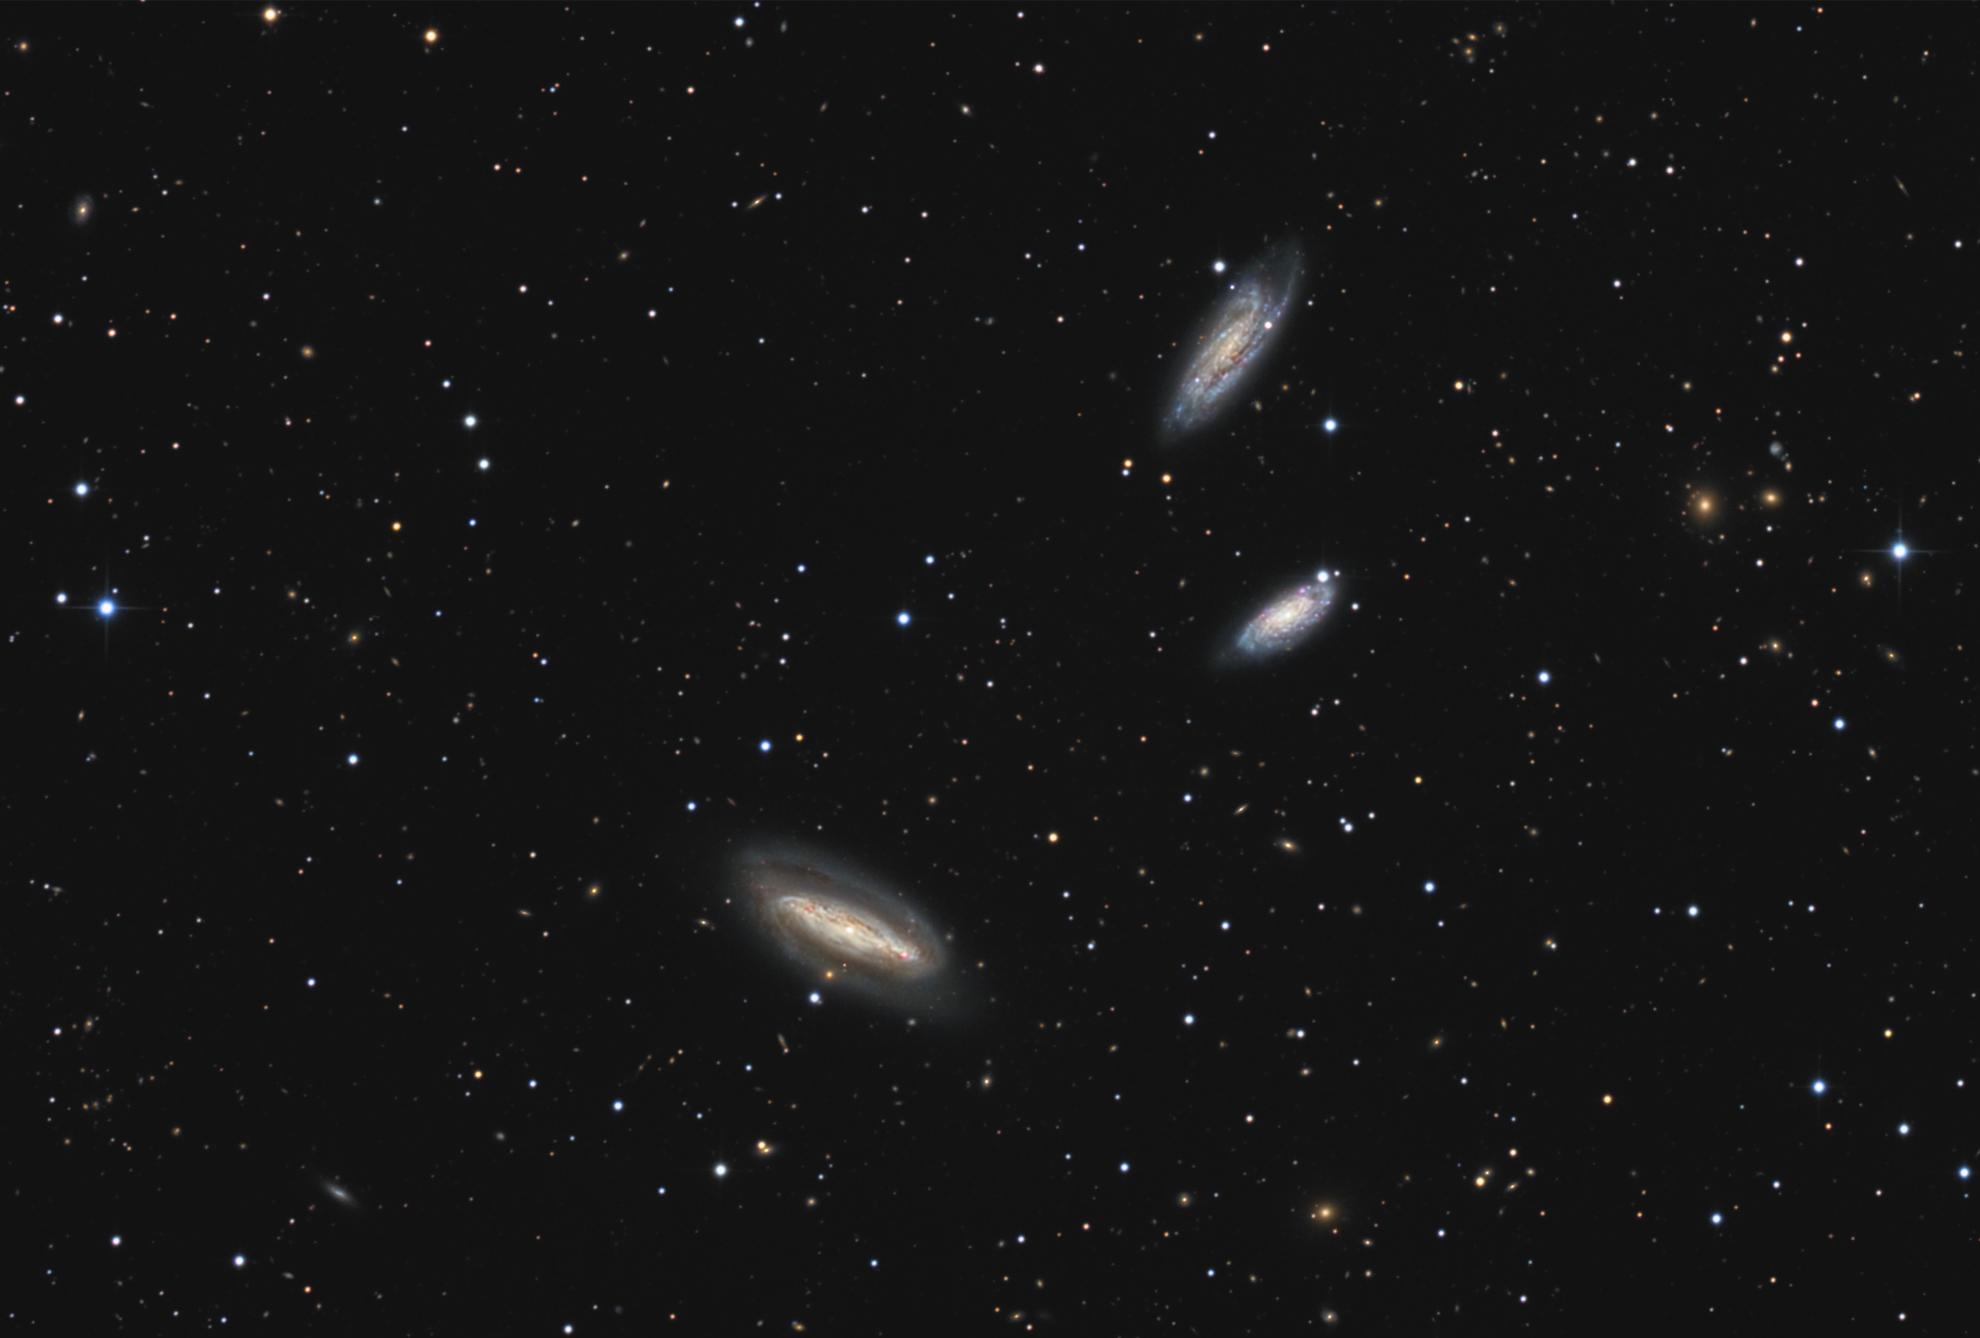 NGC7582-90-99-LRGB-20151014-T30-300s-TTK